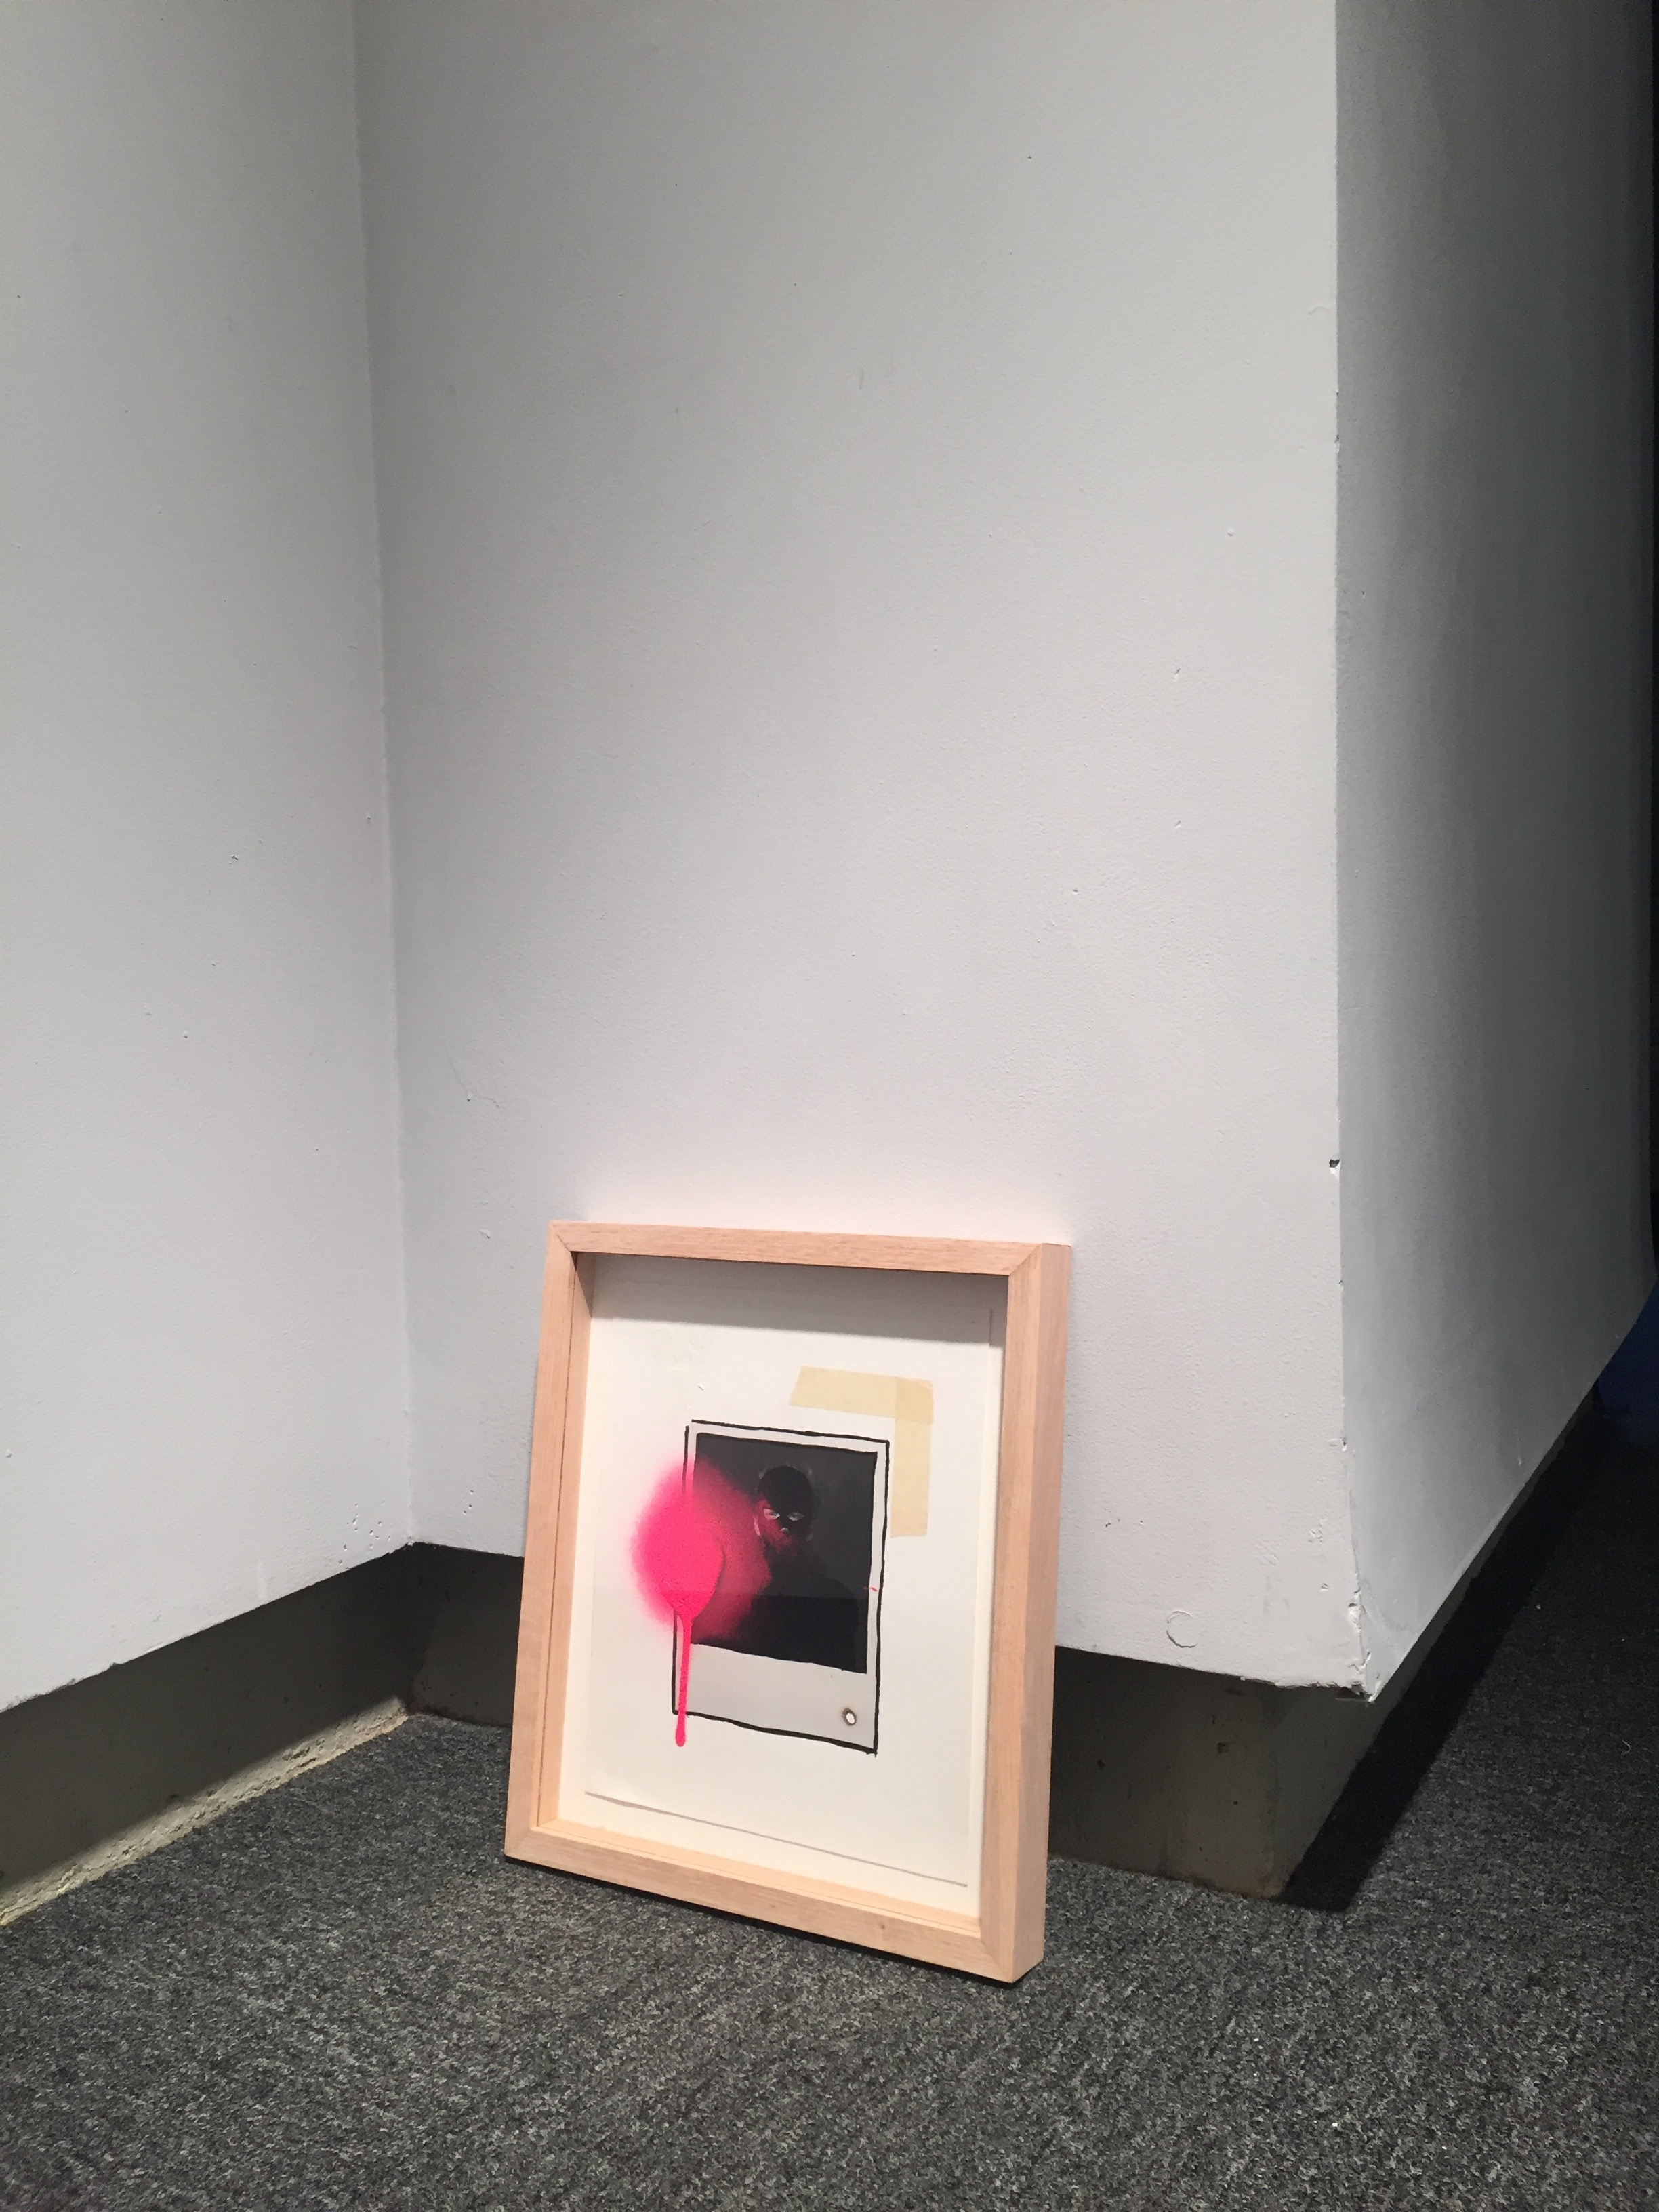 Untitled Study (1967-2015), 2015